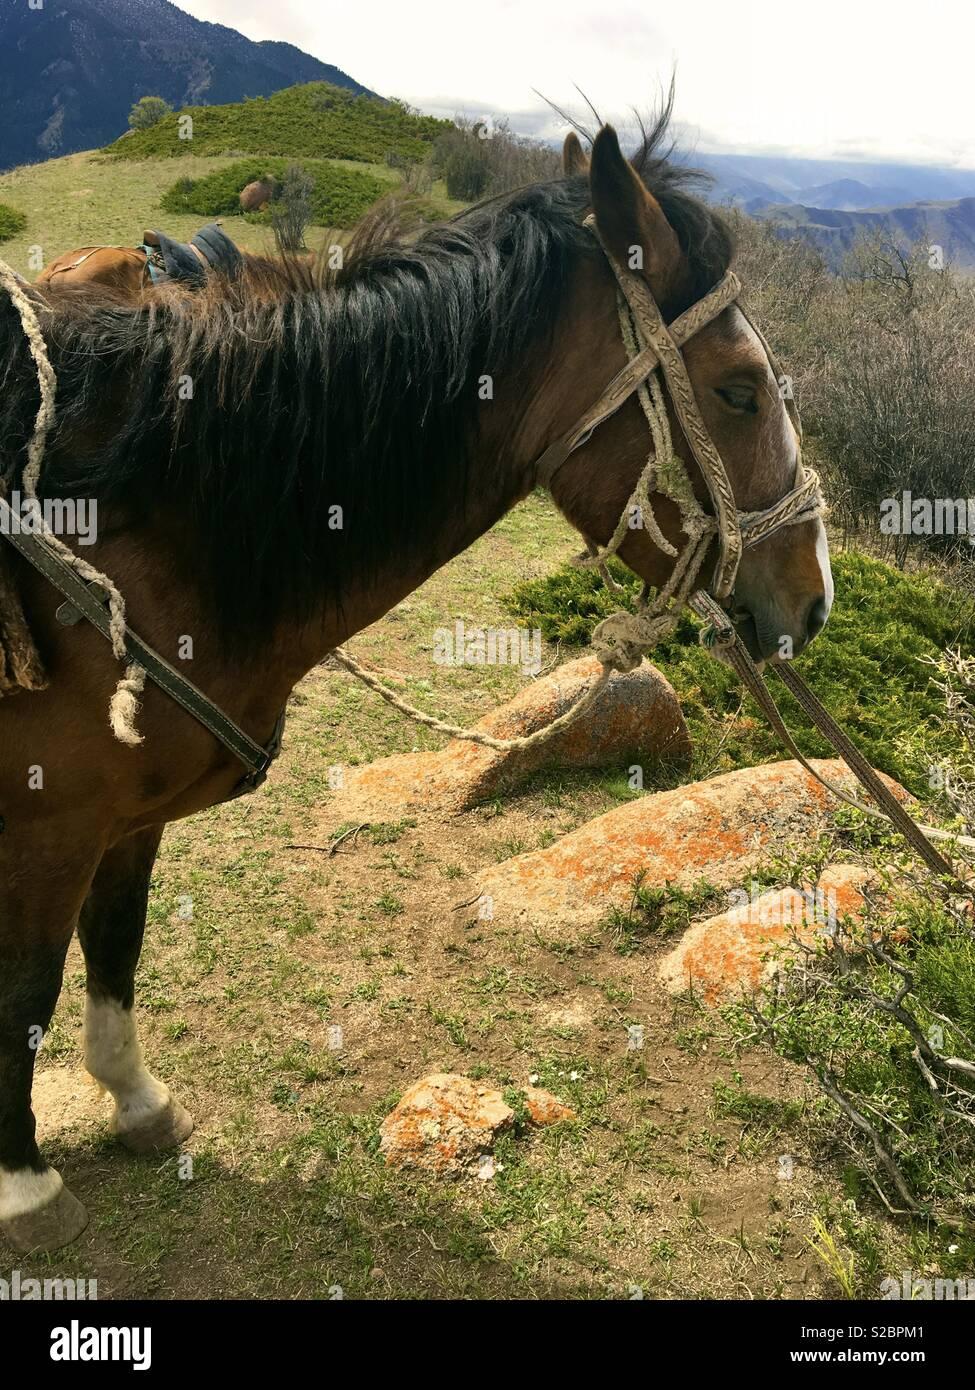 Kyrgyz horse on a mountain trek - Stock Image